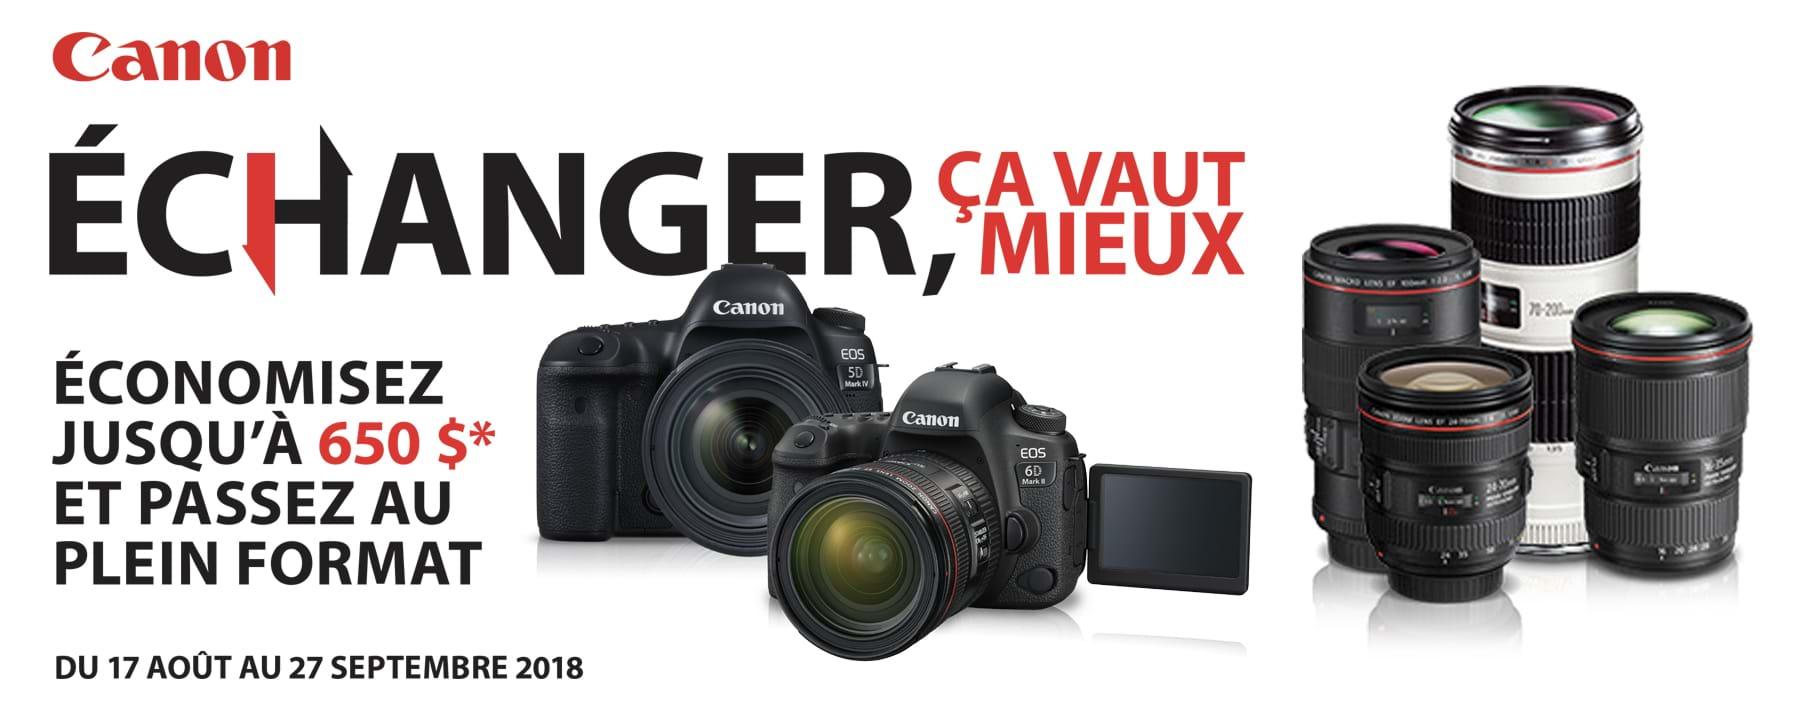 Canon échange